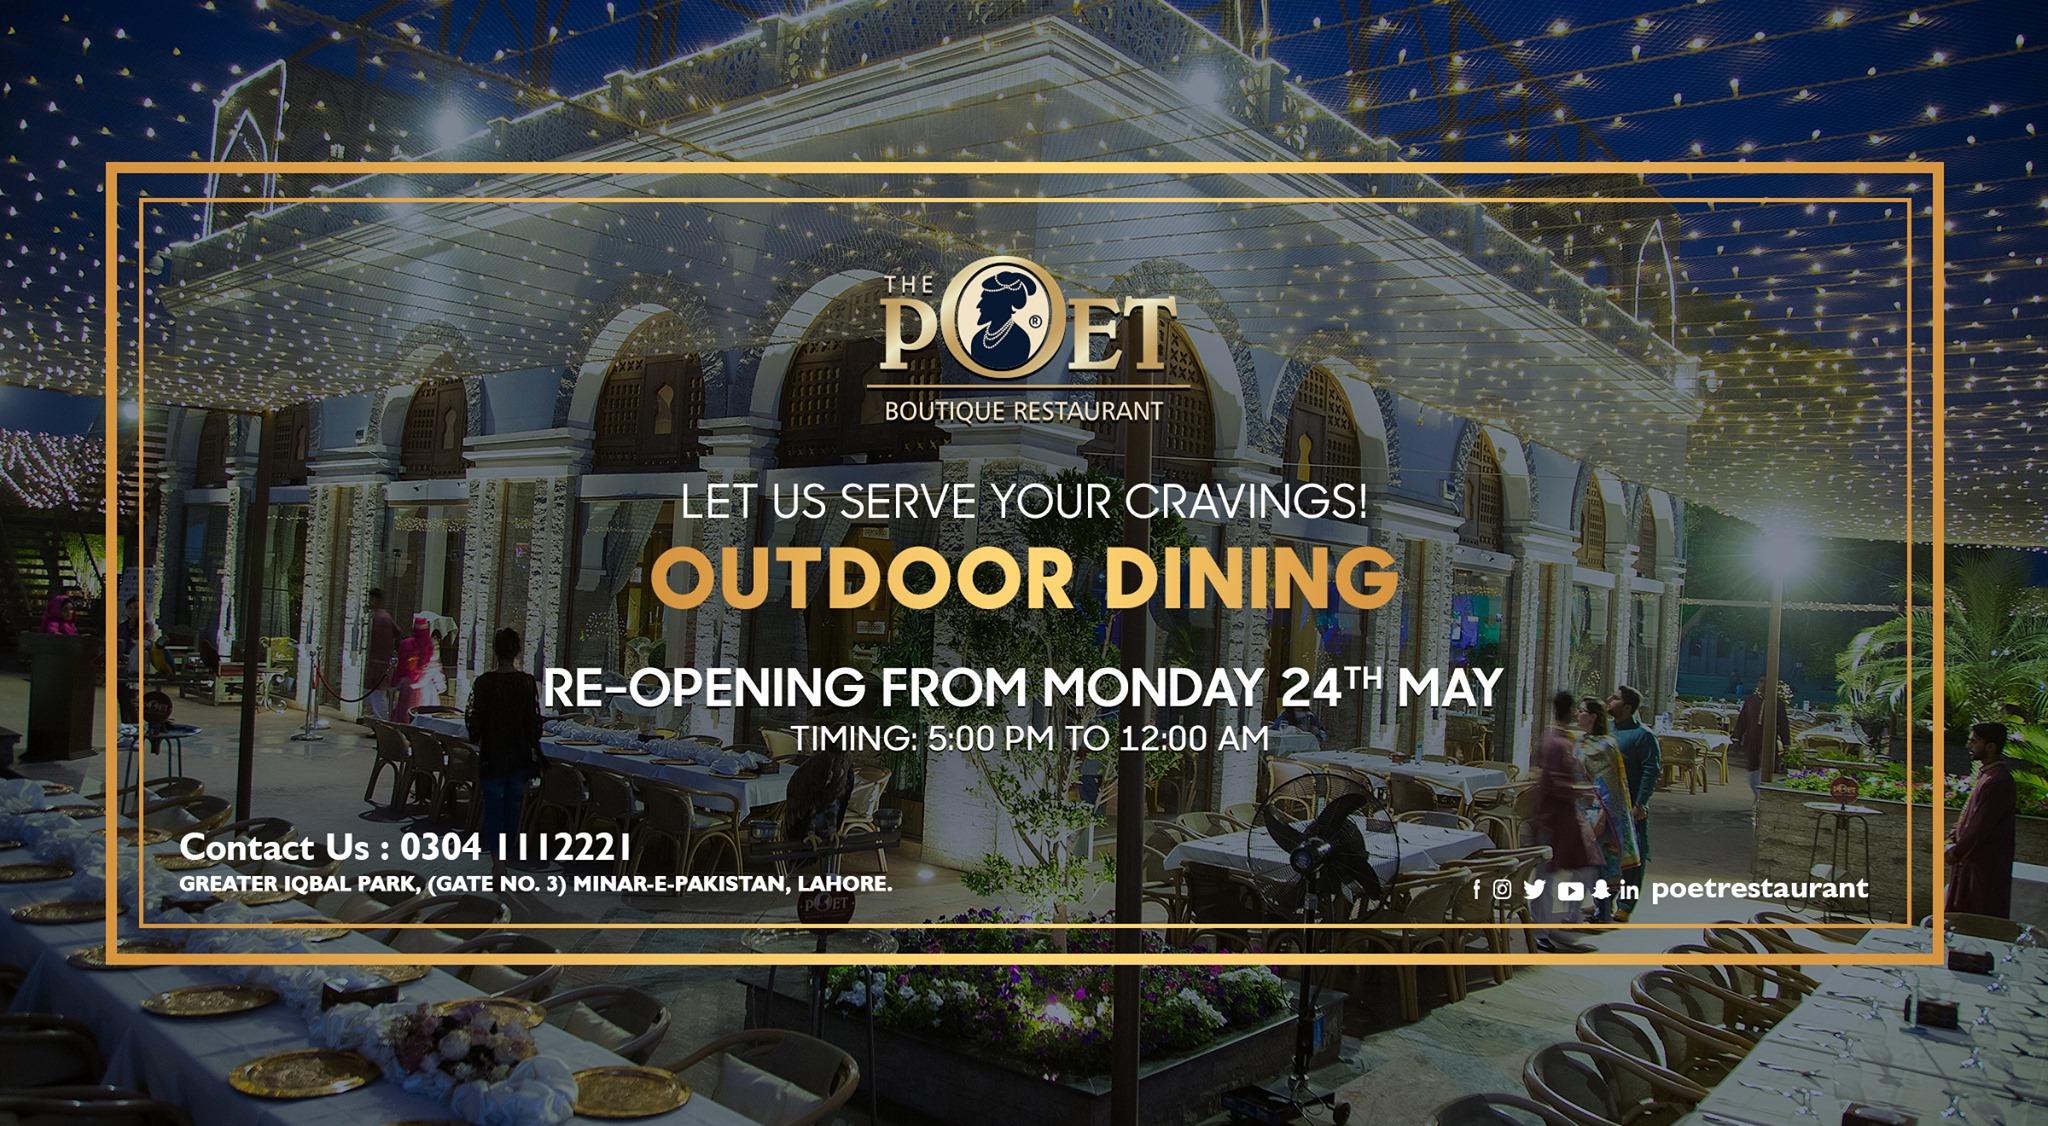 poet restaurant